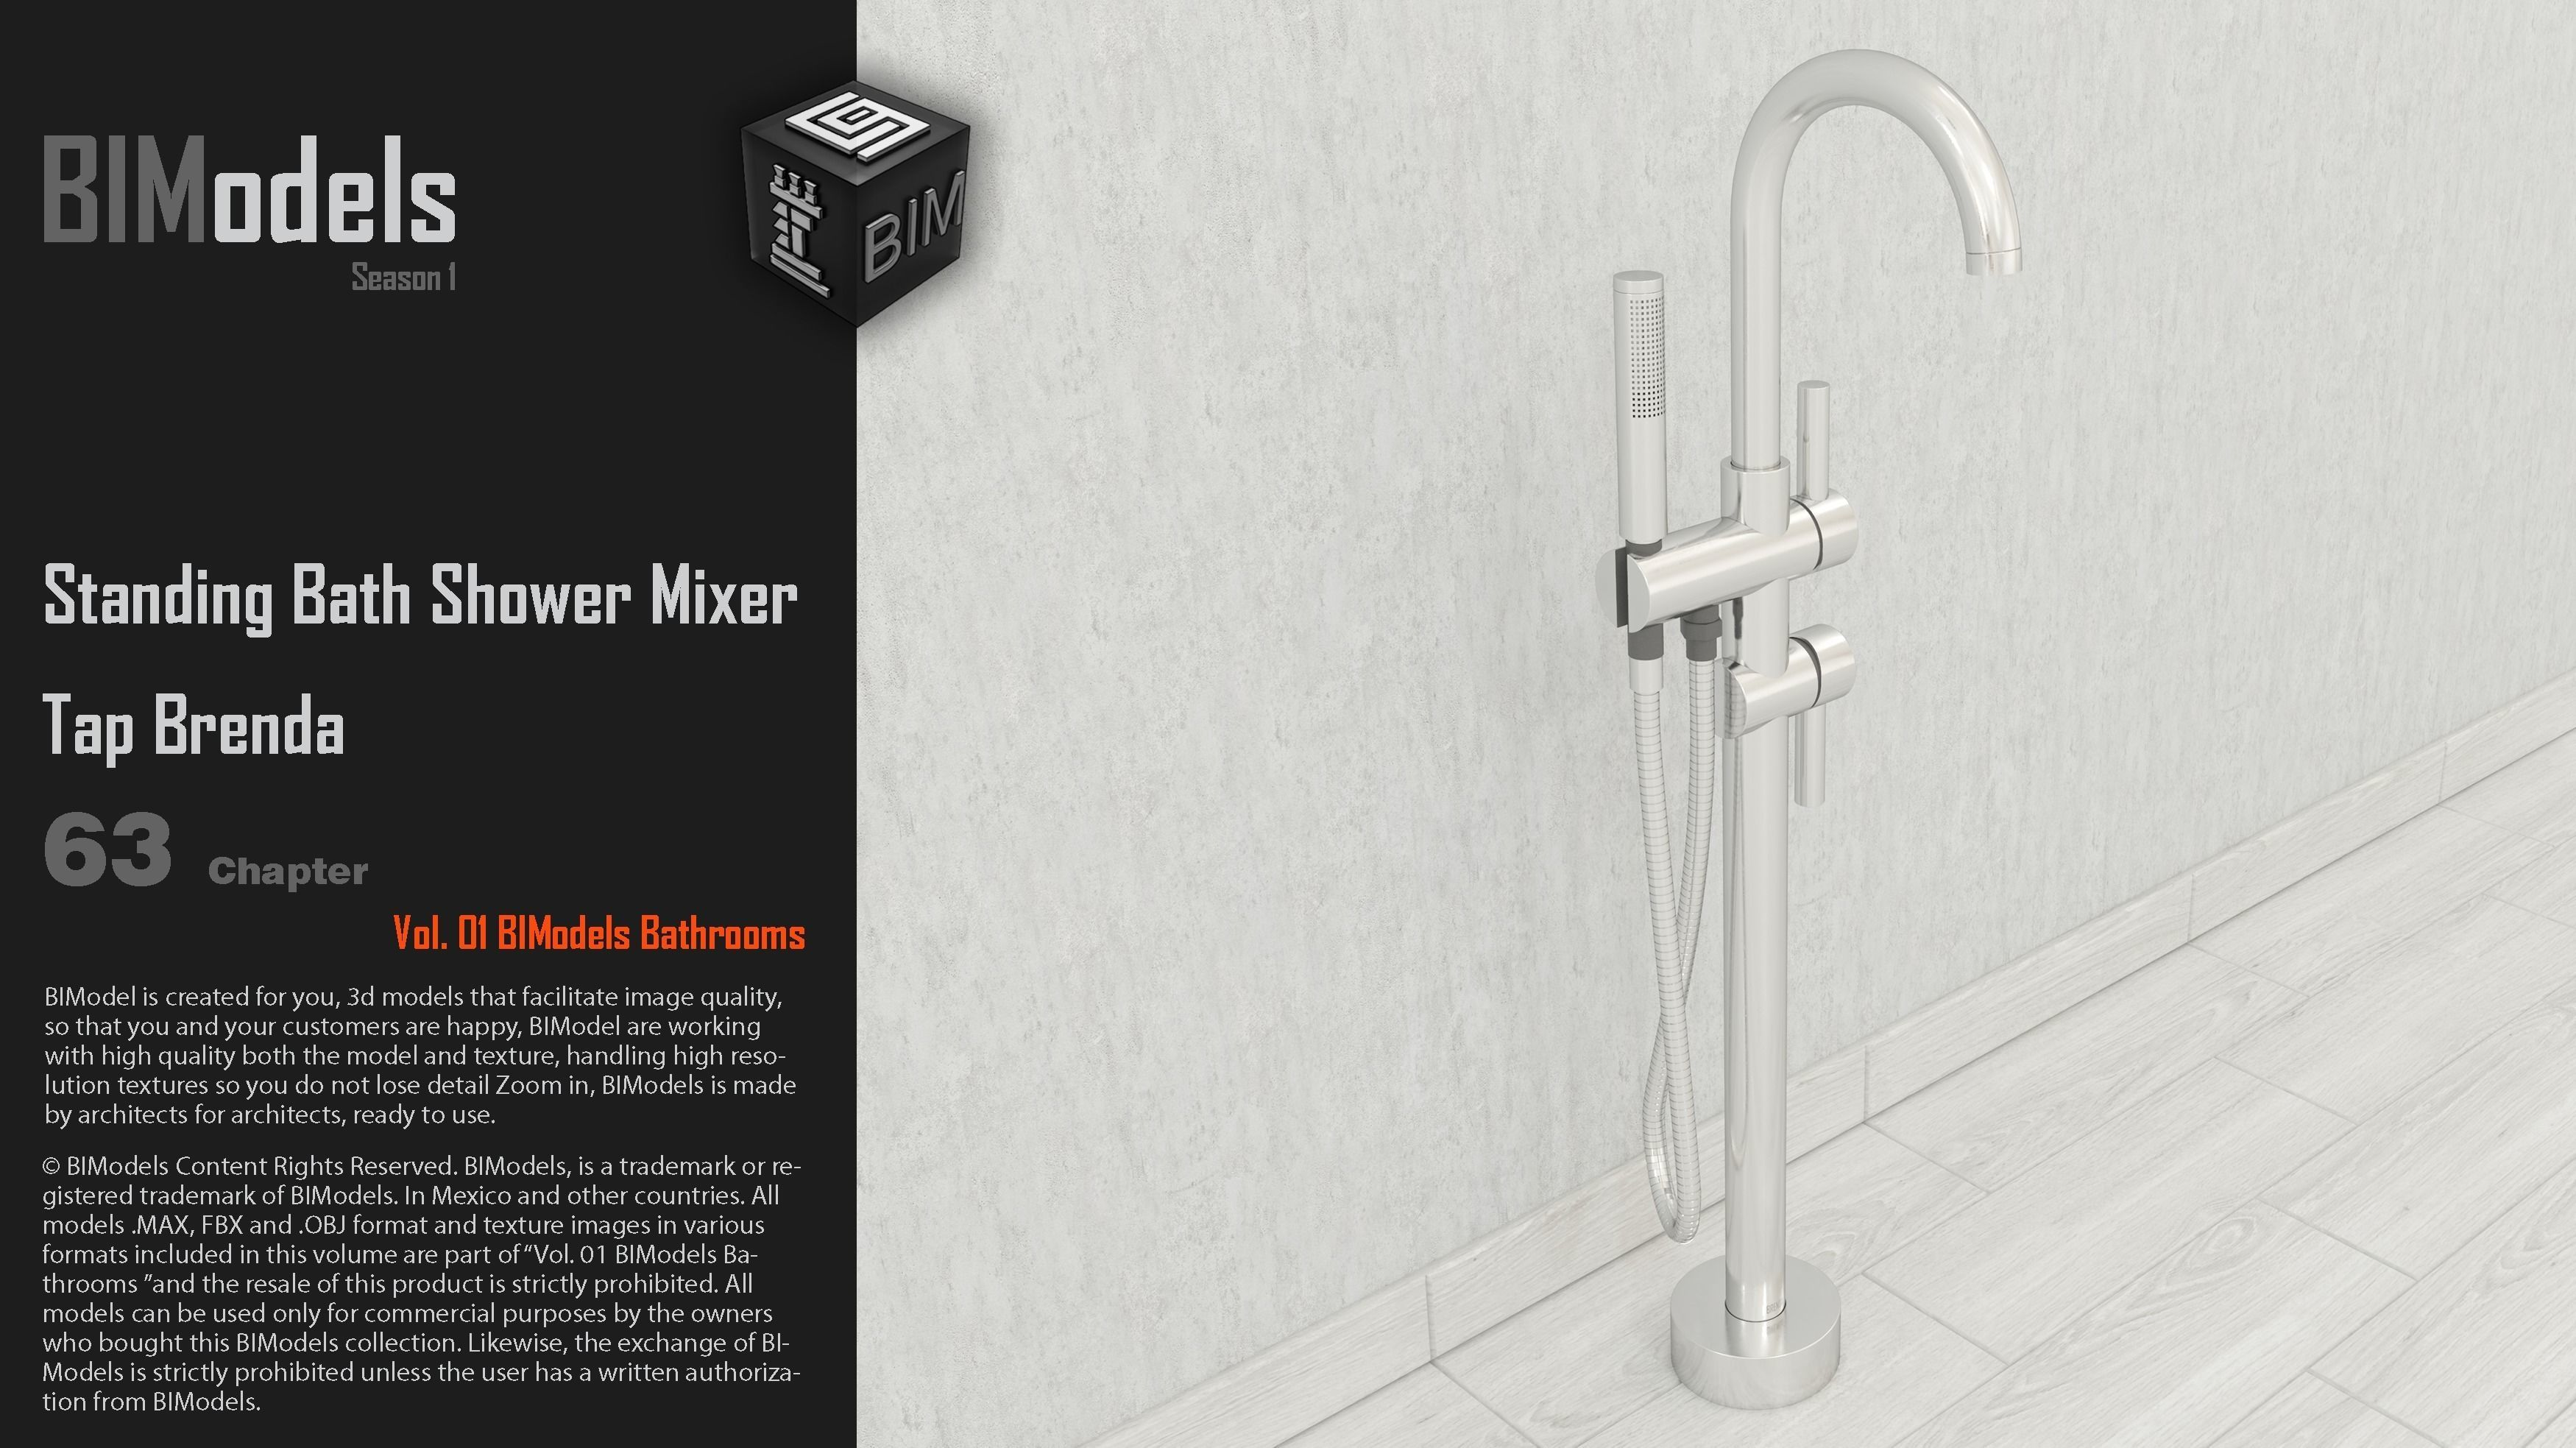 0163 Standing Bath Shower Mixer Tap Brenda